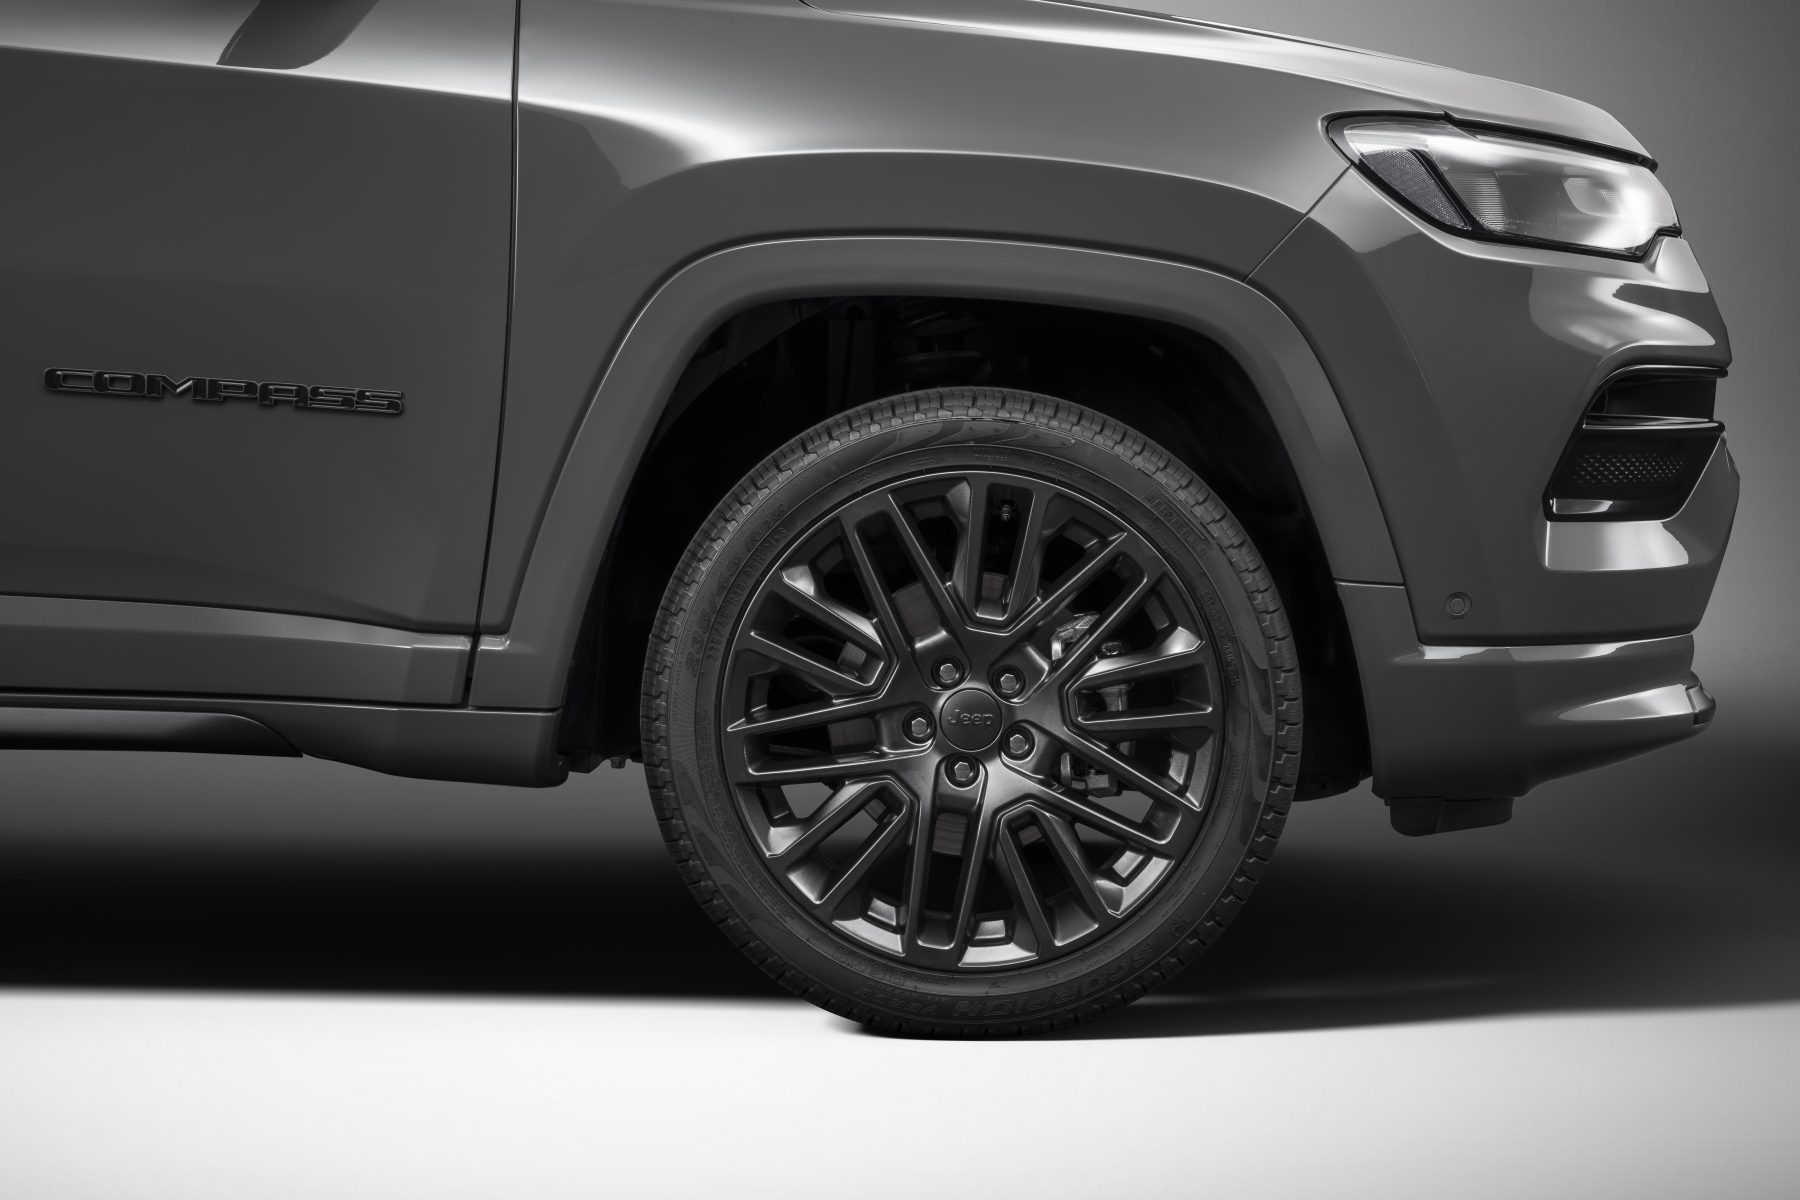 jeep compass s 2022 5